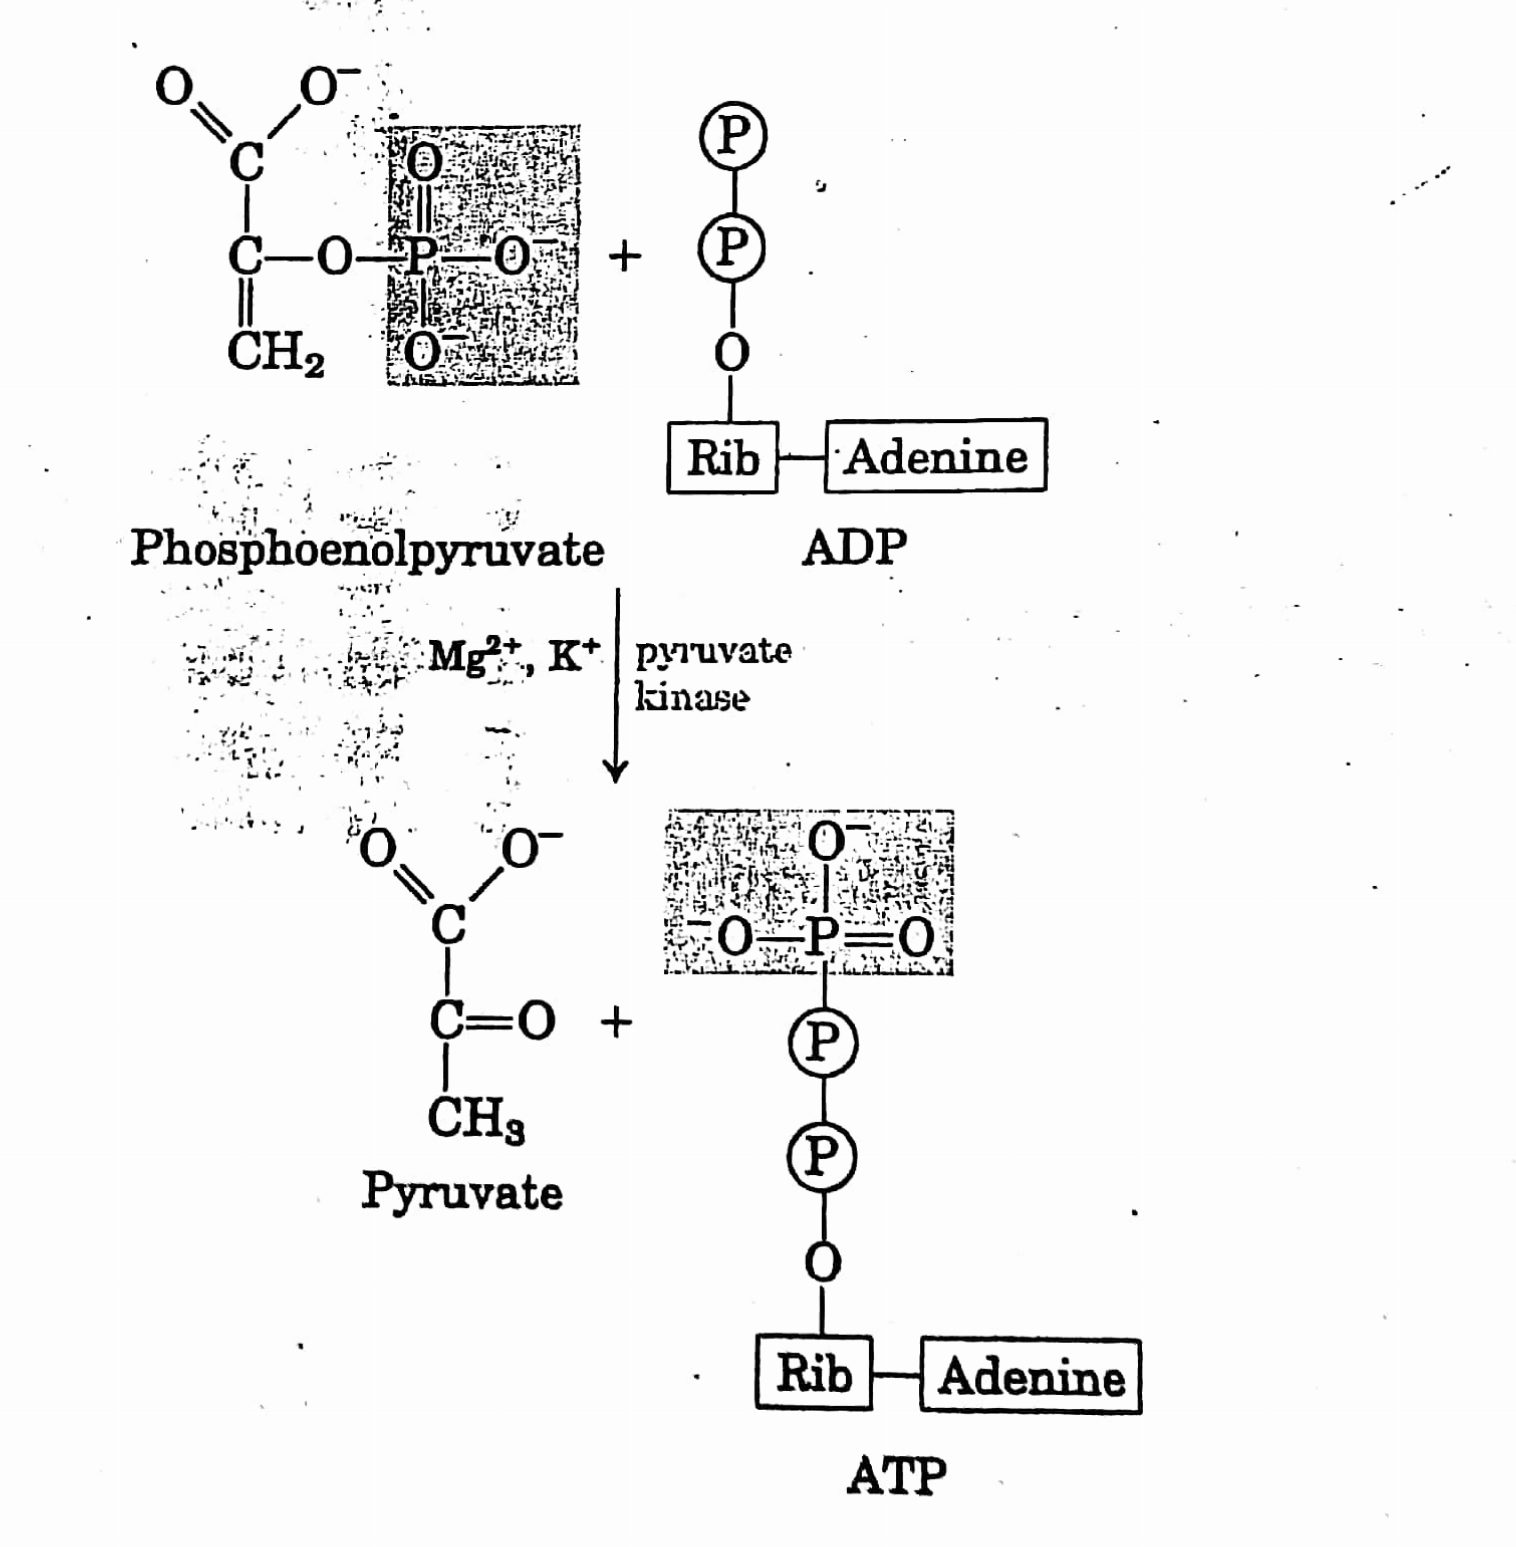 hight resolution of glycolysis or emp embden meyerhof parnas pathway